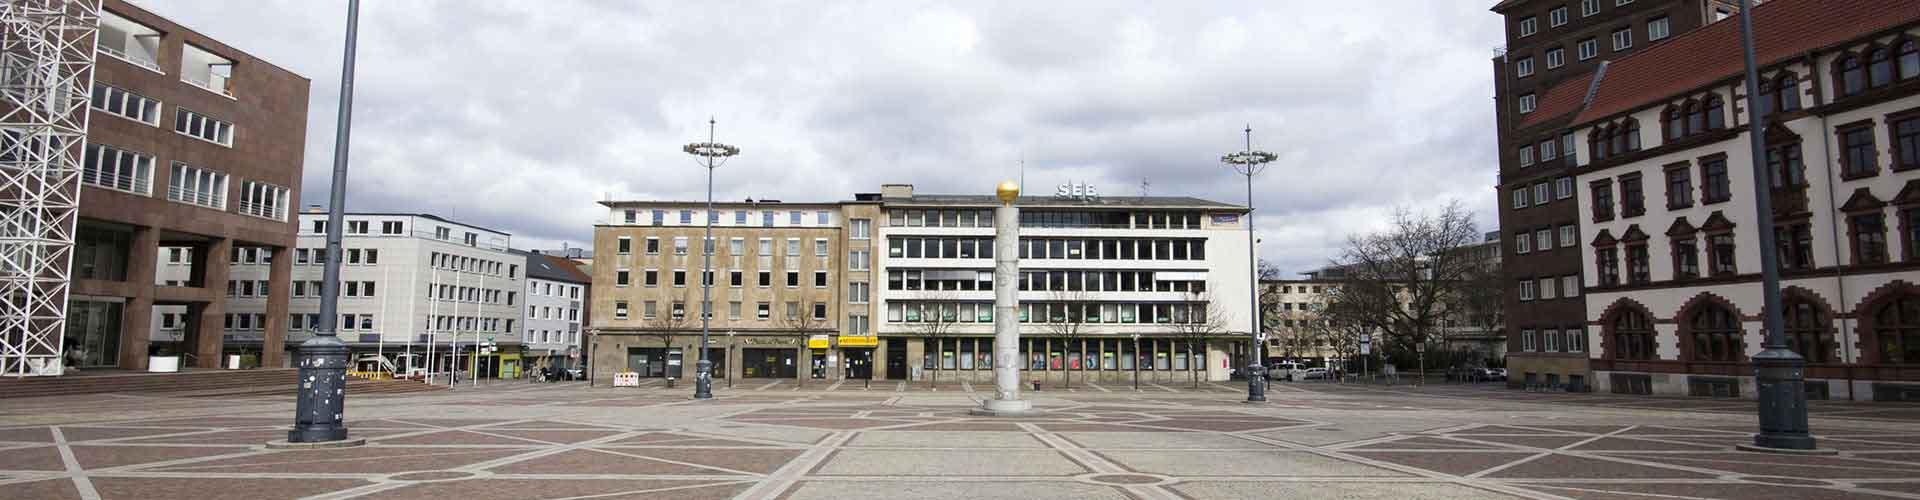 Dortmund - Camping à Dortmund. Cartes pour Dortmund, photos et commentaires pour chaque Camping à Dortmund.